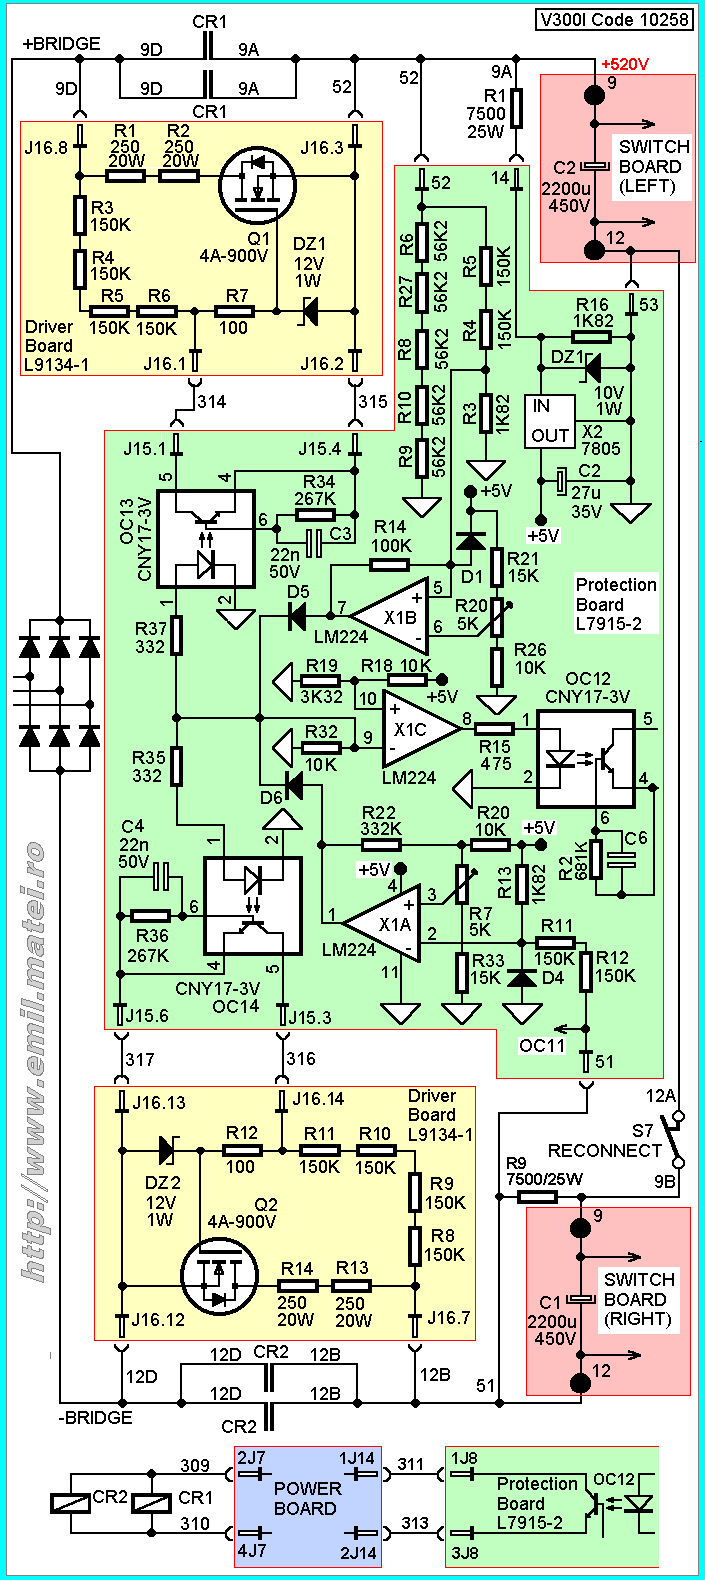 Astonishing Circuit Diagram Welding Inverter Wiring Diagram Pmz Wiring Cloud Mousmenurrecoveryedborg